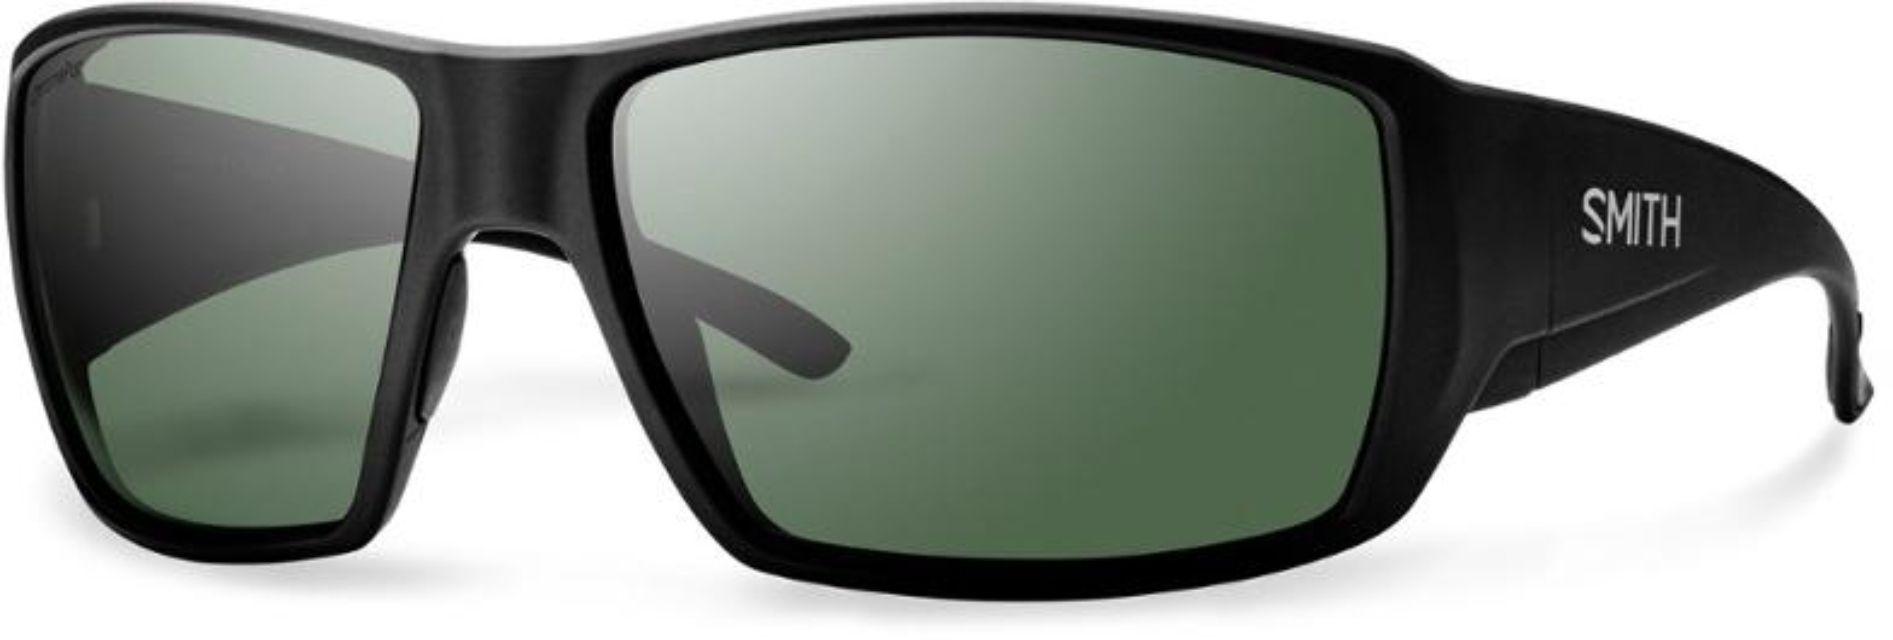 efff0bc4ef Best for Women  Guide s Choice ChromaPop Polarized sunglasses